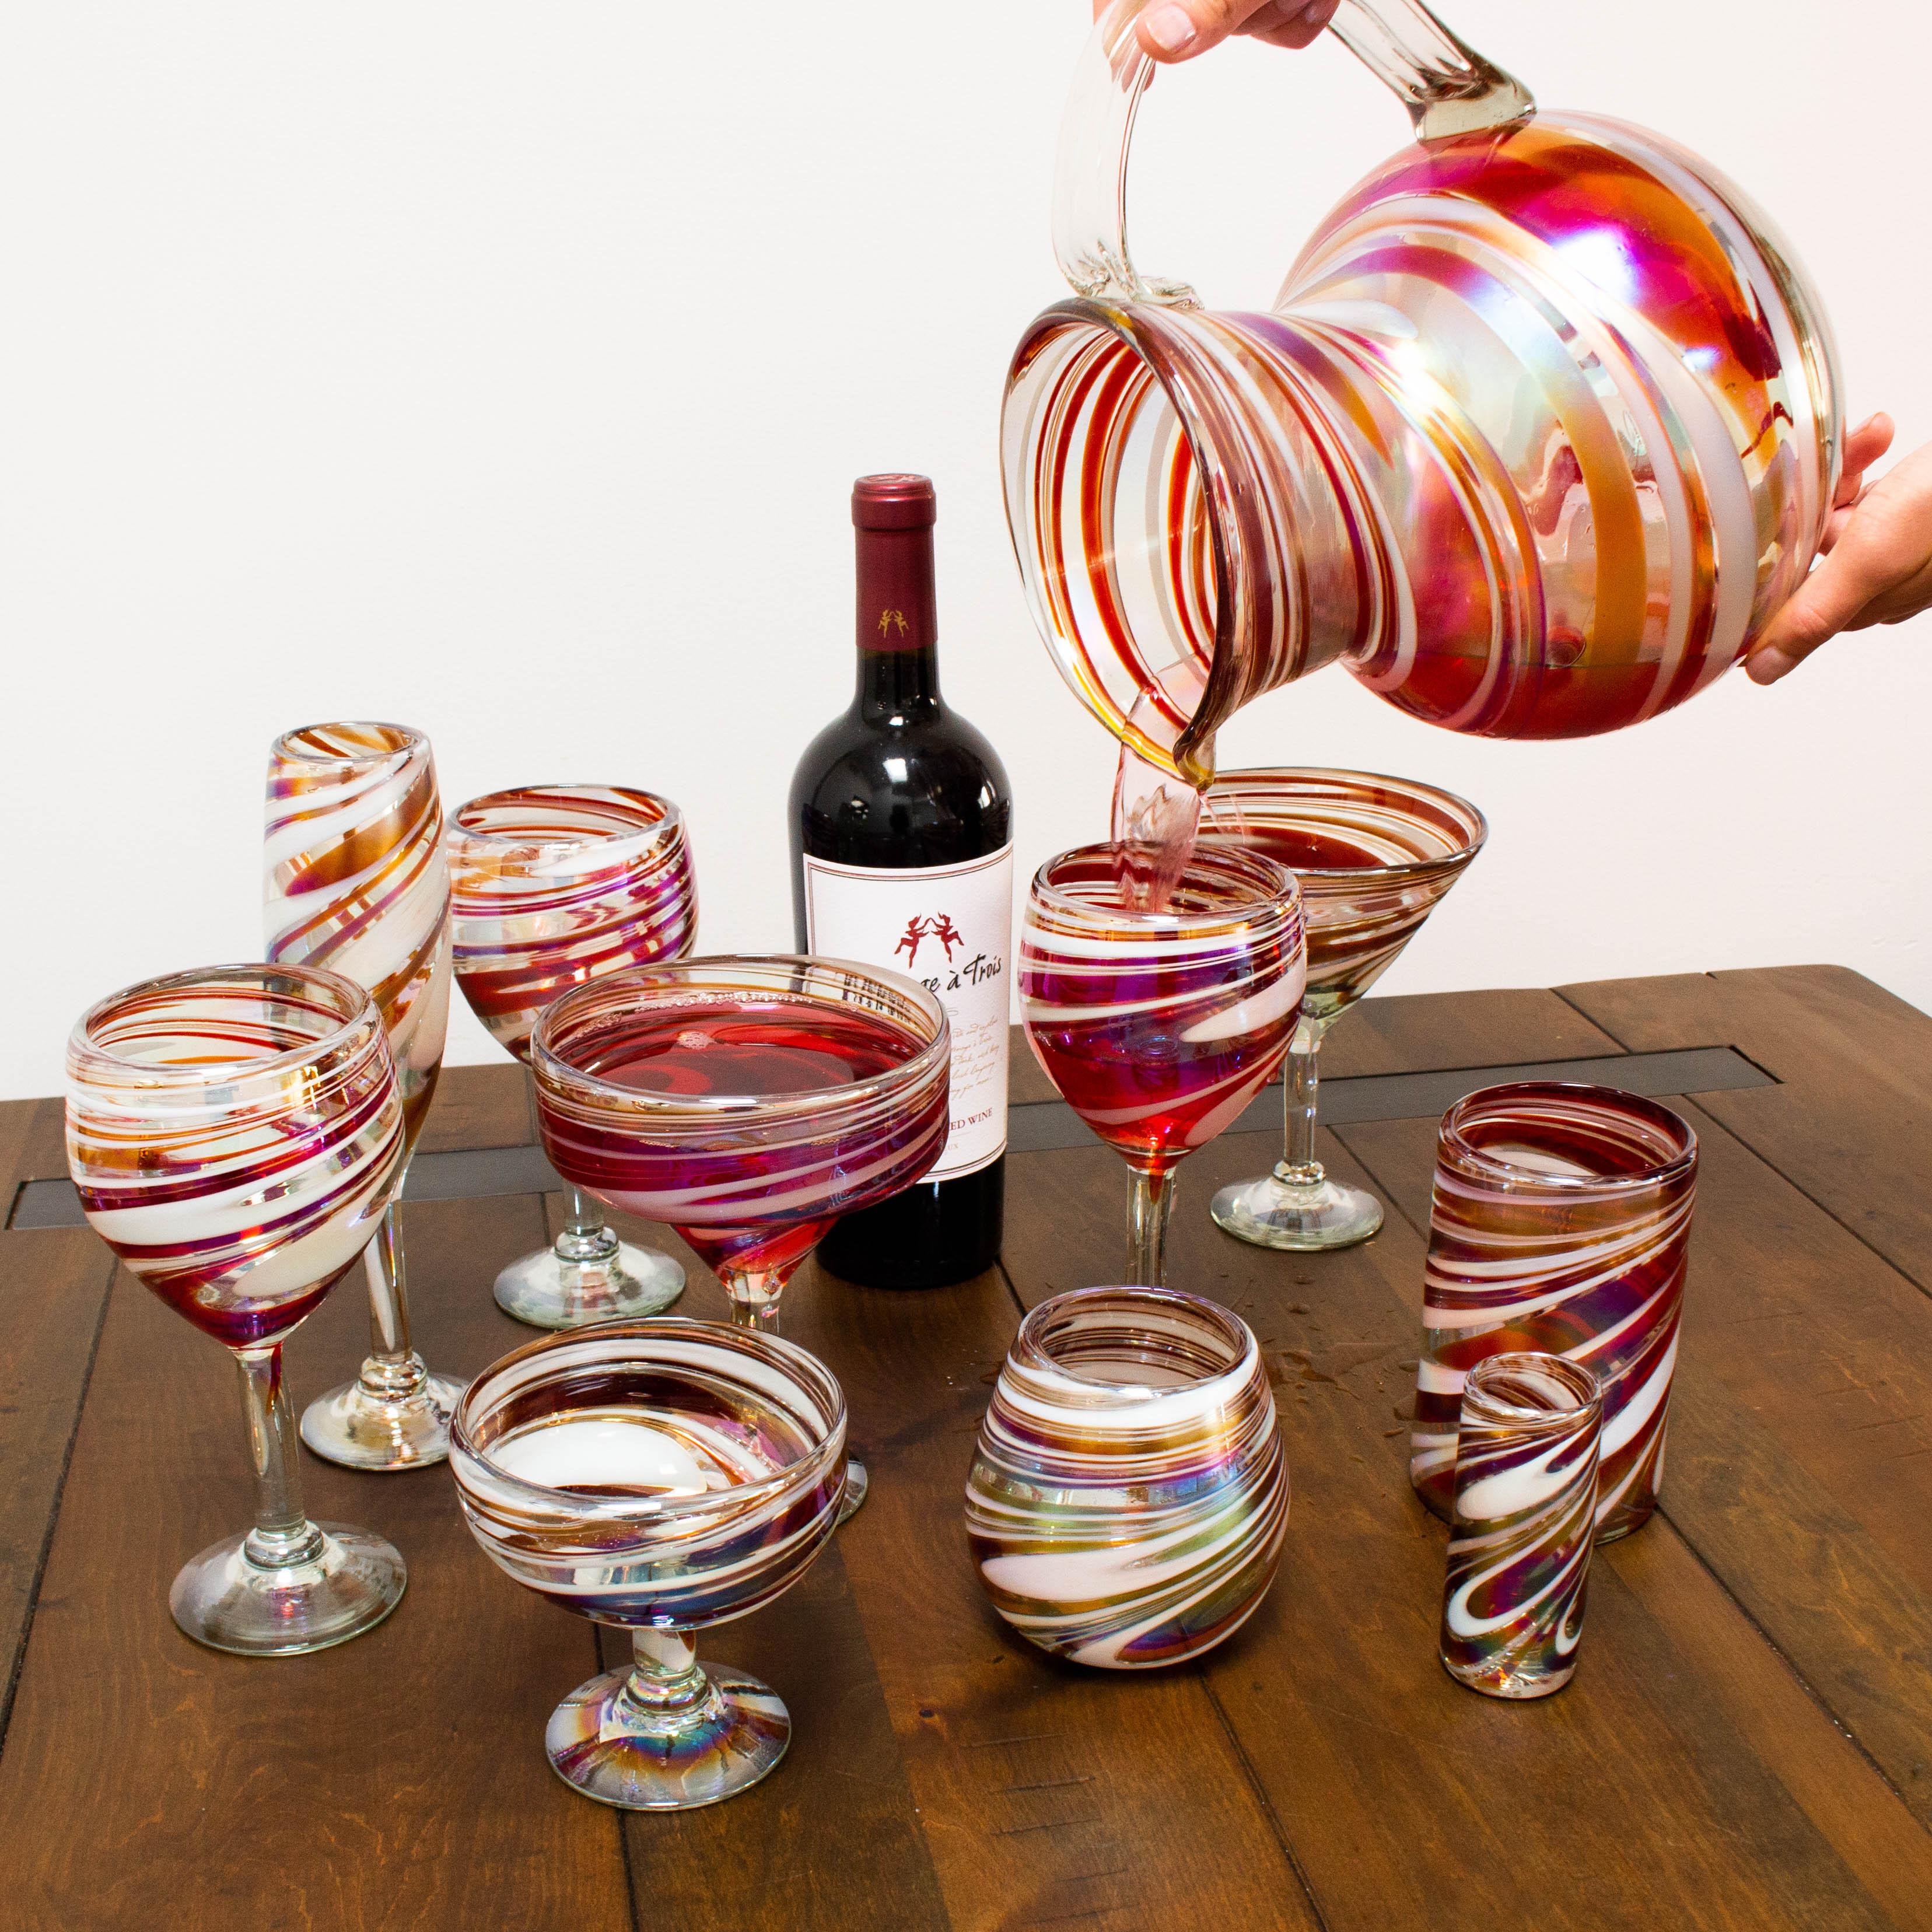 Festive swirl pitcher